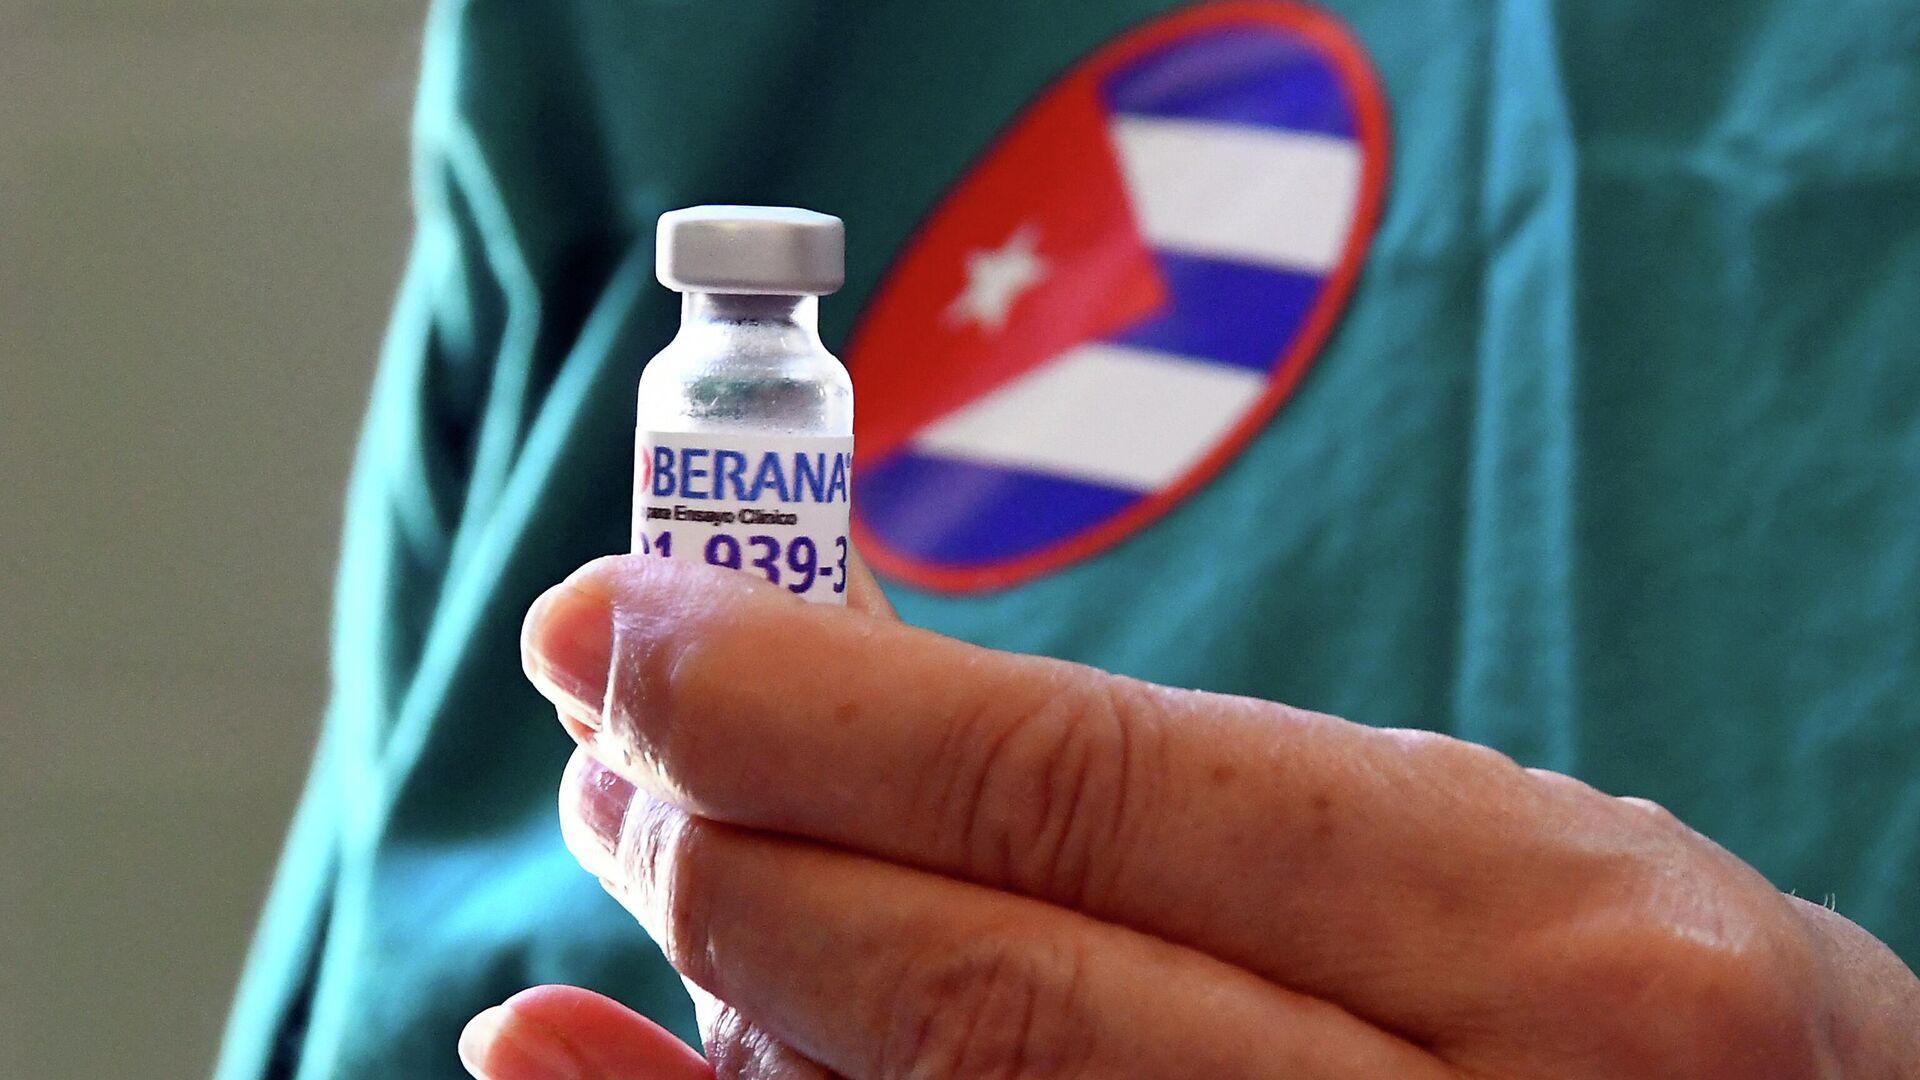 Dosis de la vacuna contra COVID-19 Soberana 2 - Sputnik Mundo, 1920, 20.06.2021